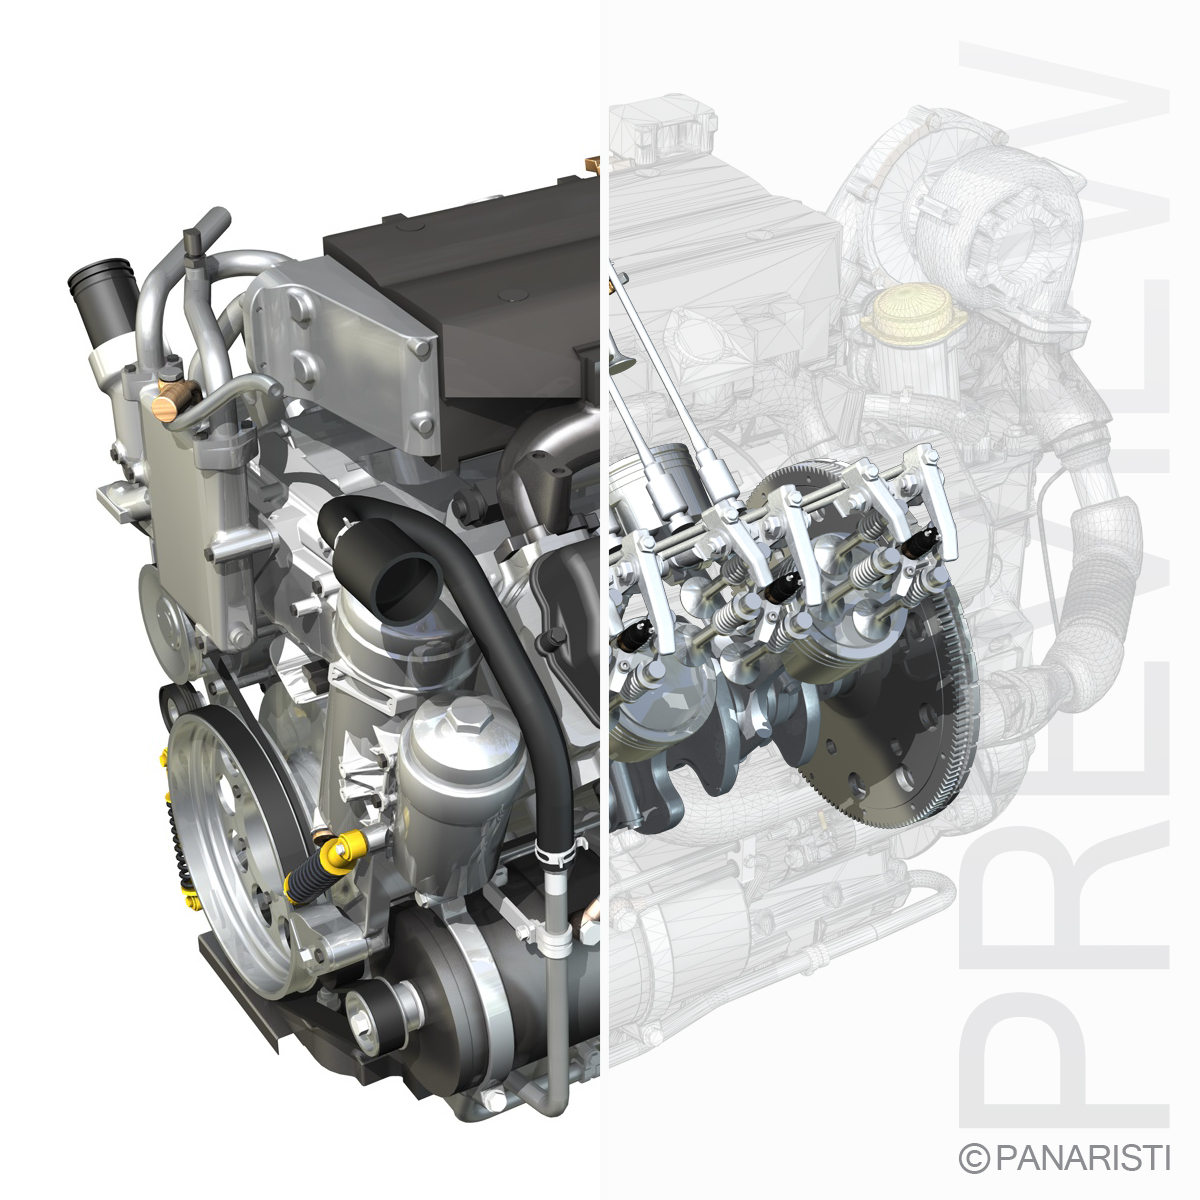 diesel turbo engine with interior parts 3d model 3ds c4d lwo obj 128856